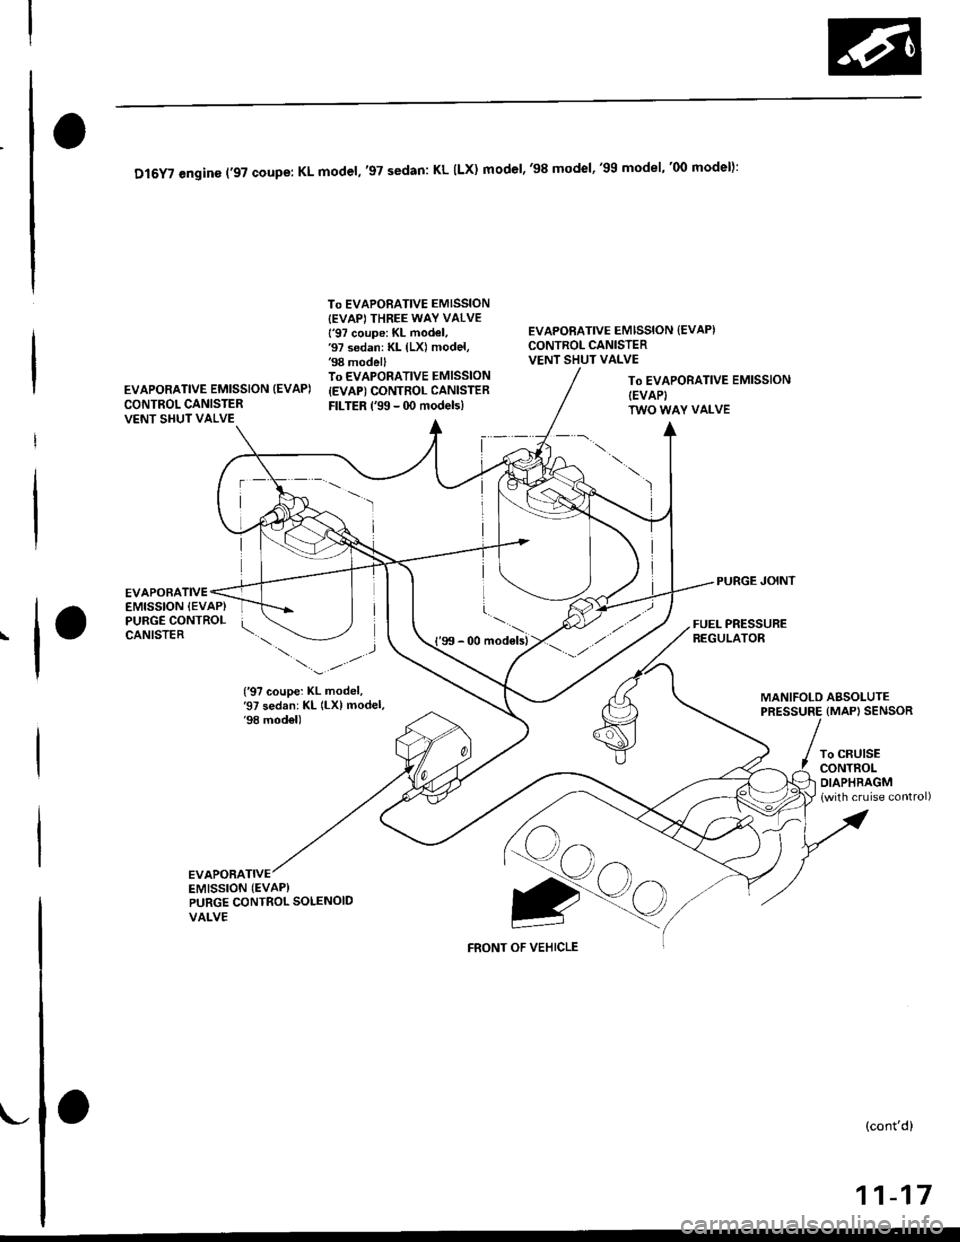 wrg 6251] china chopper 49cc wiring diagram solenoid x2 pocket bike wiring diagram china chopper 49cc wiring diagram #5